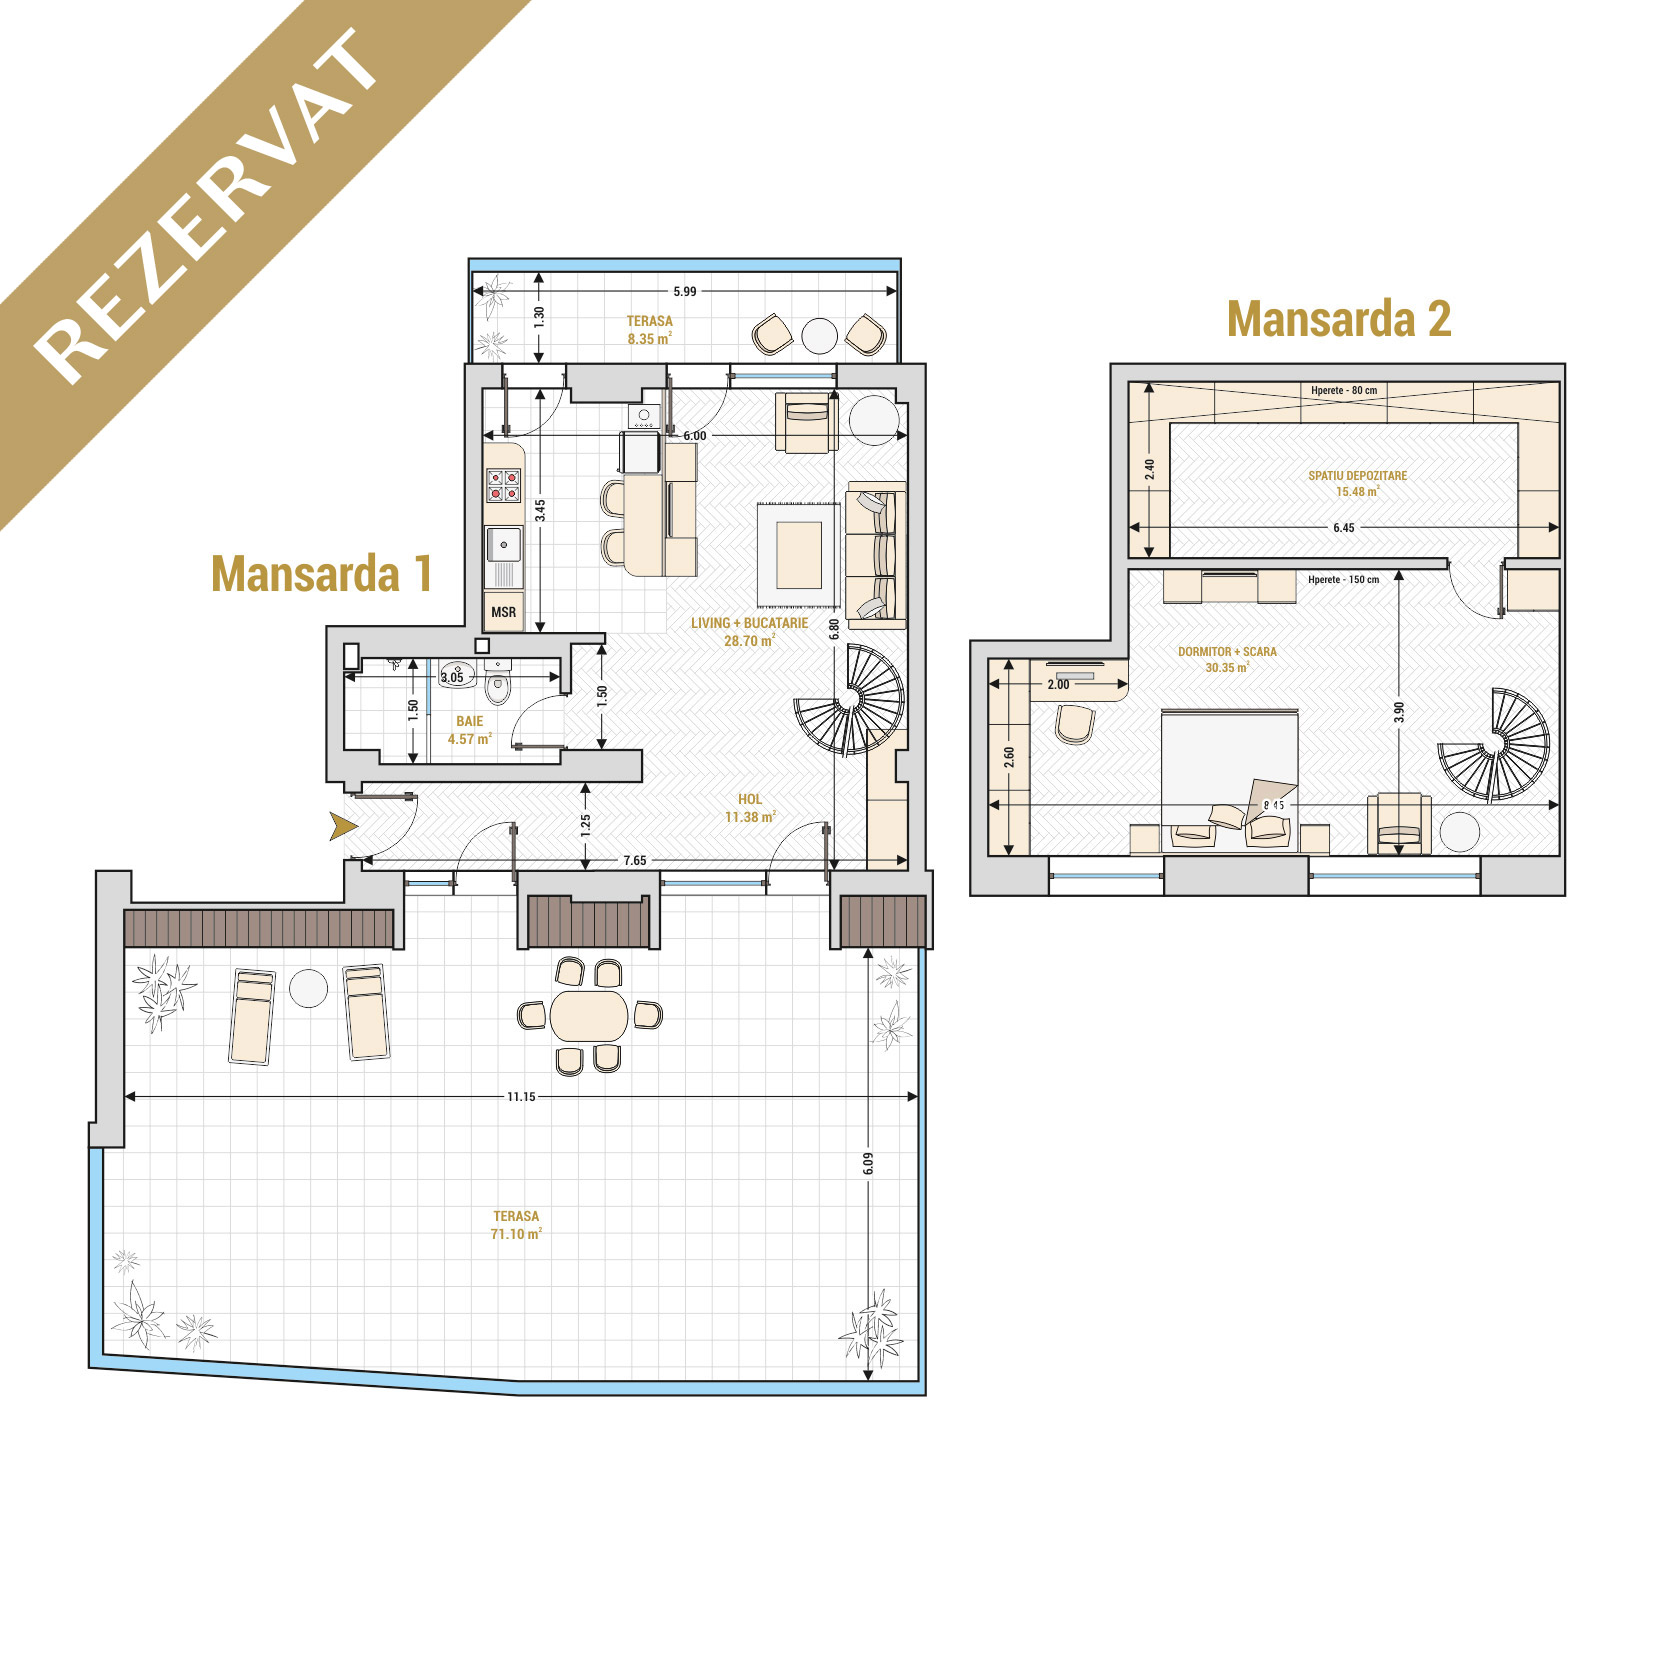 Duplex cu 2 camere de vanzare Bucuresti - Catedral Residence - Marriott, Piata Unirii, 13 Septembrie, Izvor - Tip 4 - T1A - R